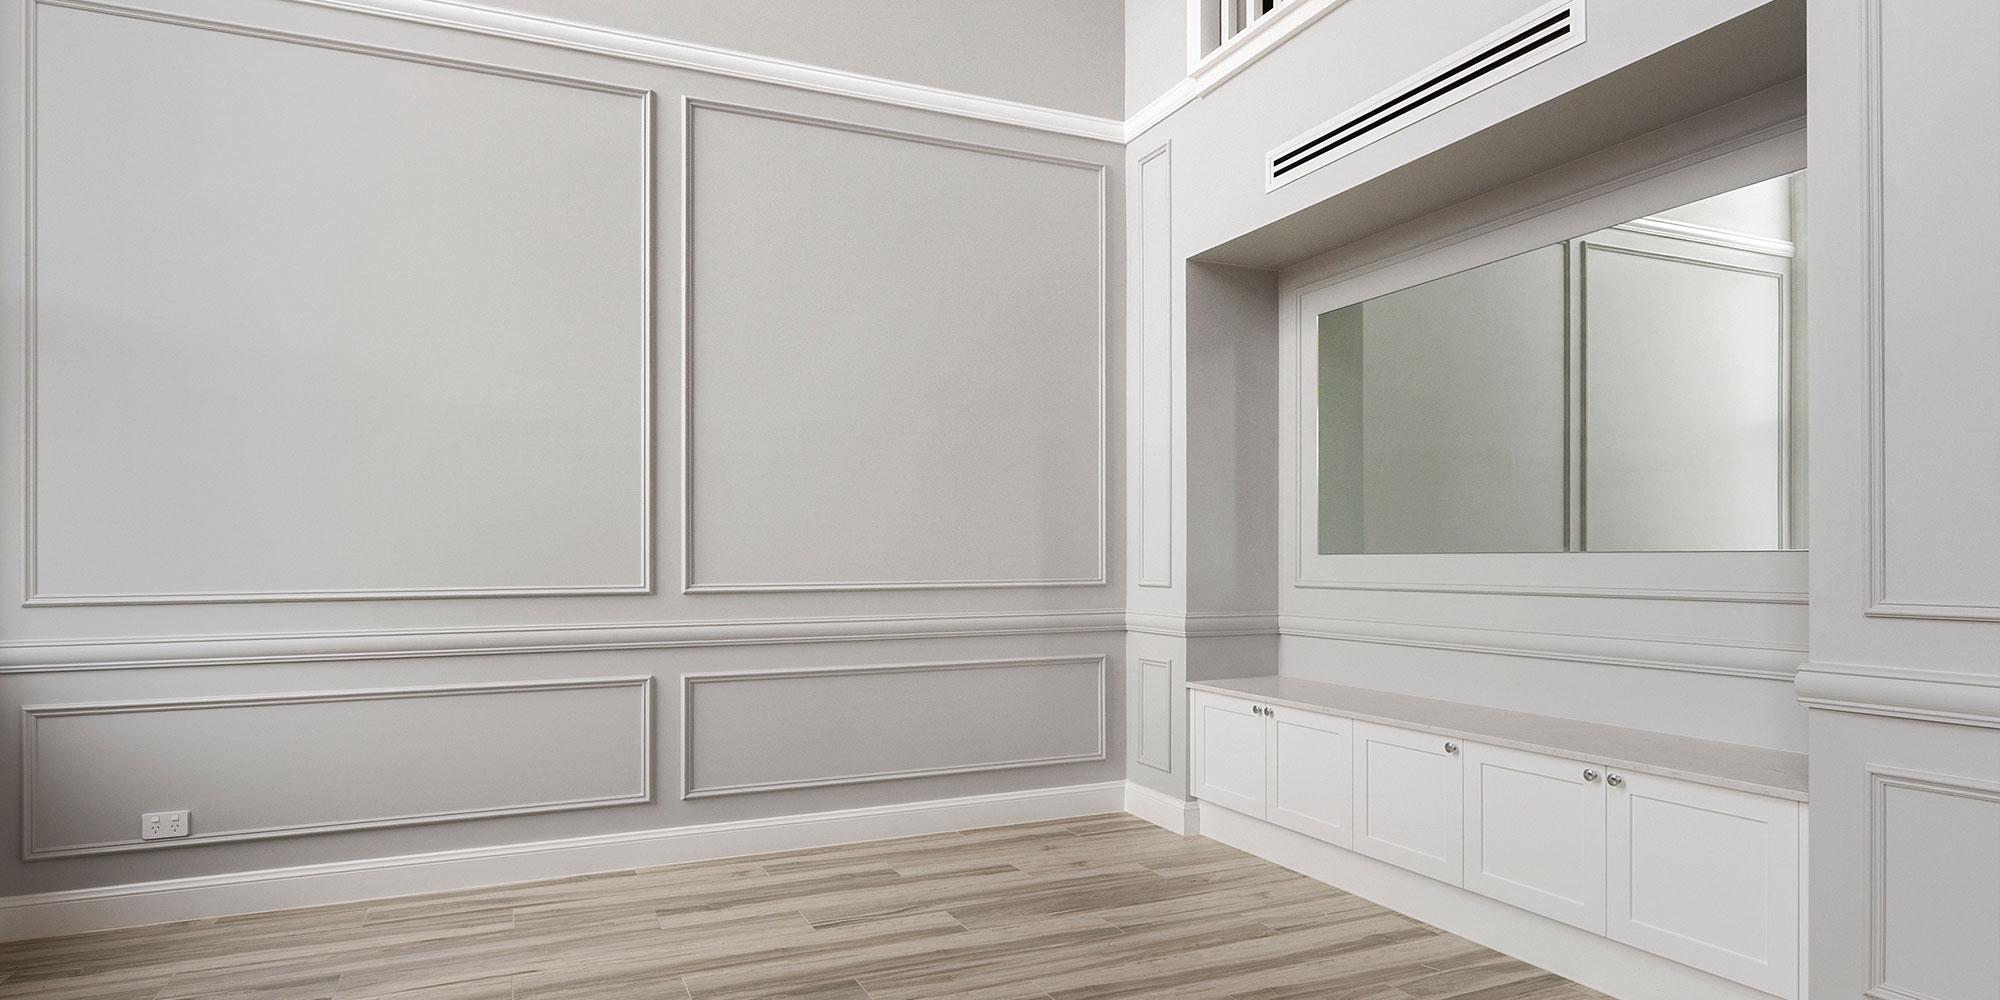 interiors-1k-7